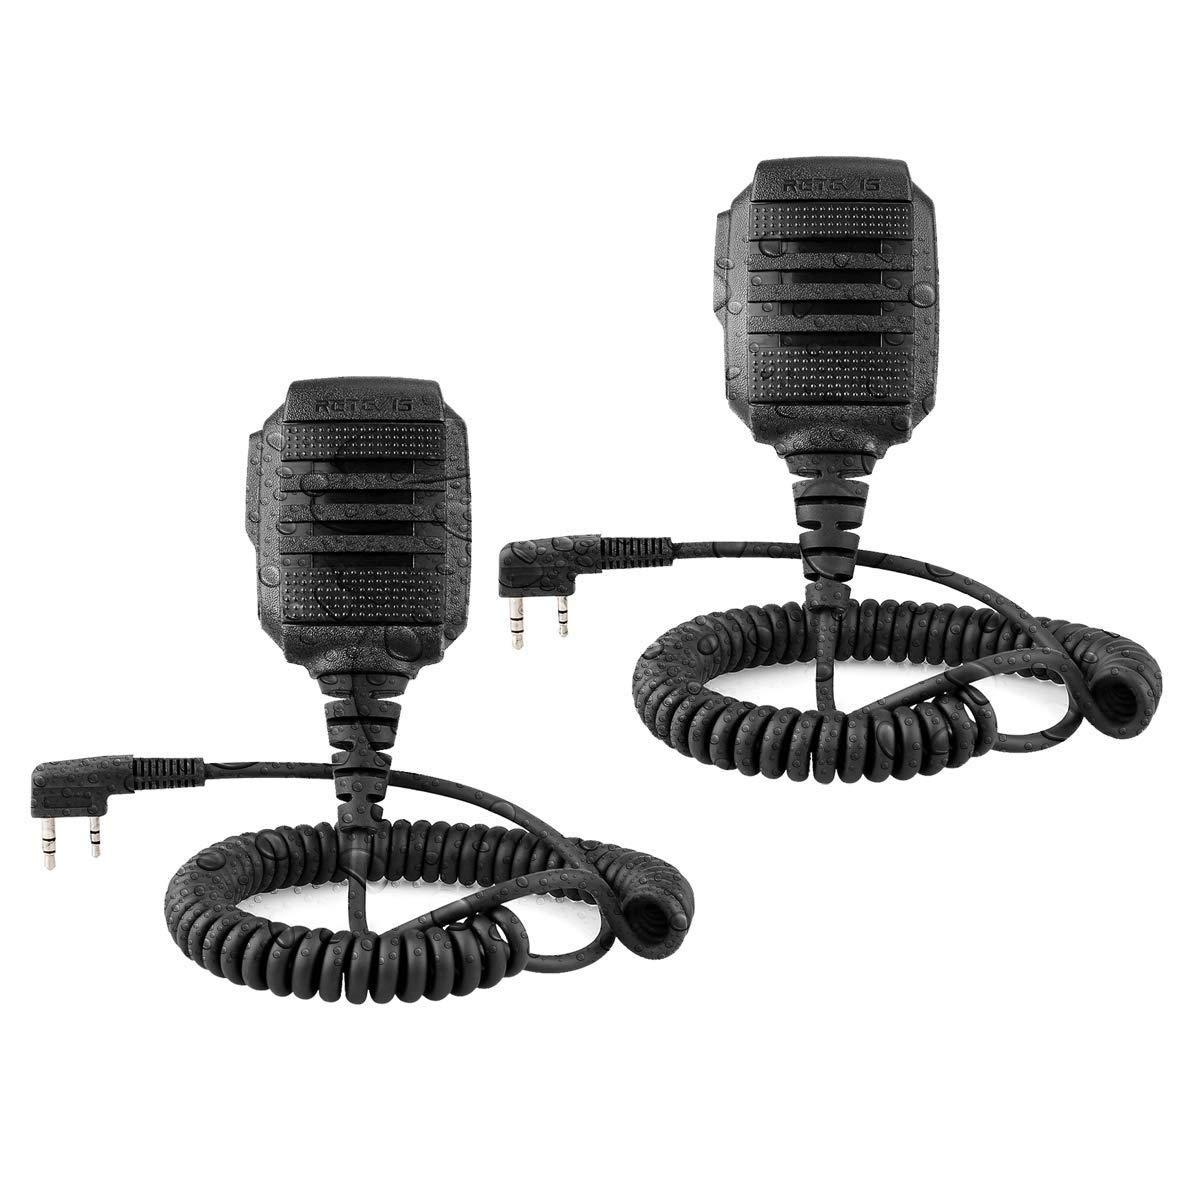 Retevis Walkie Talkie Mic Shoulder Speaker Waterproof Microphone for Baofeng UV-5R Retevis RT19 RT22 RT27 RT-5R Arcshell AR-5 Two Way Radios (2 Pack)